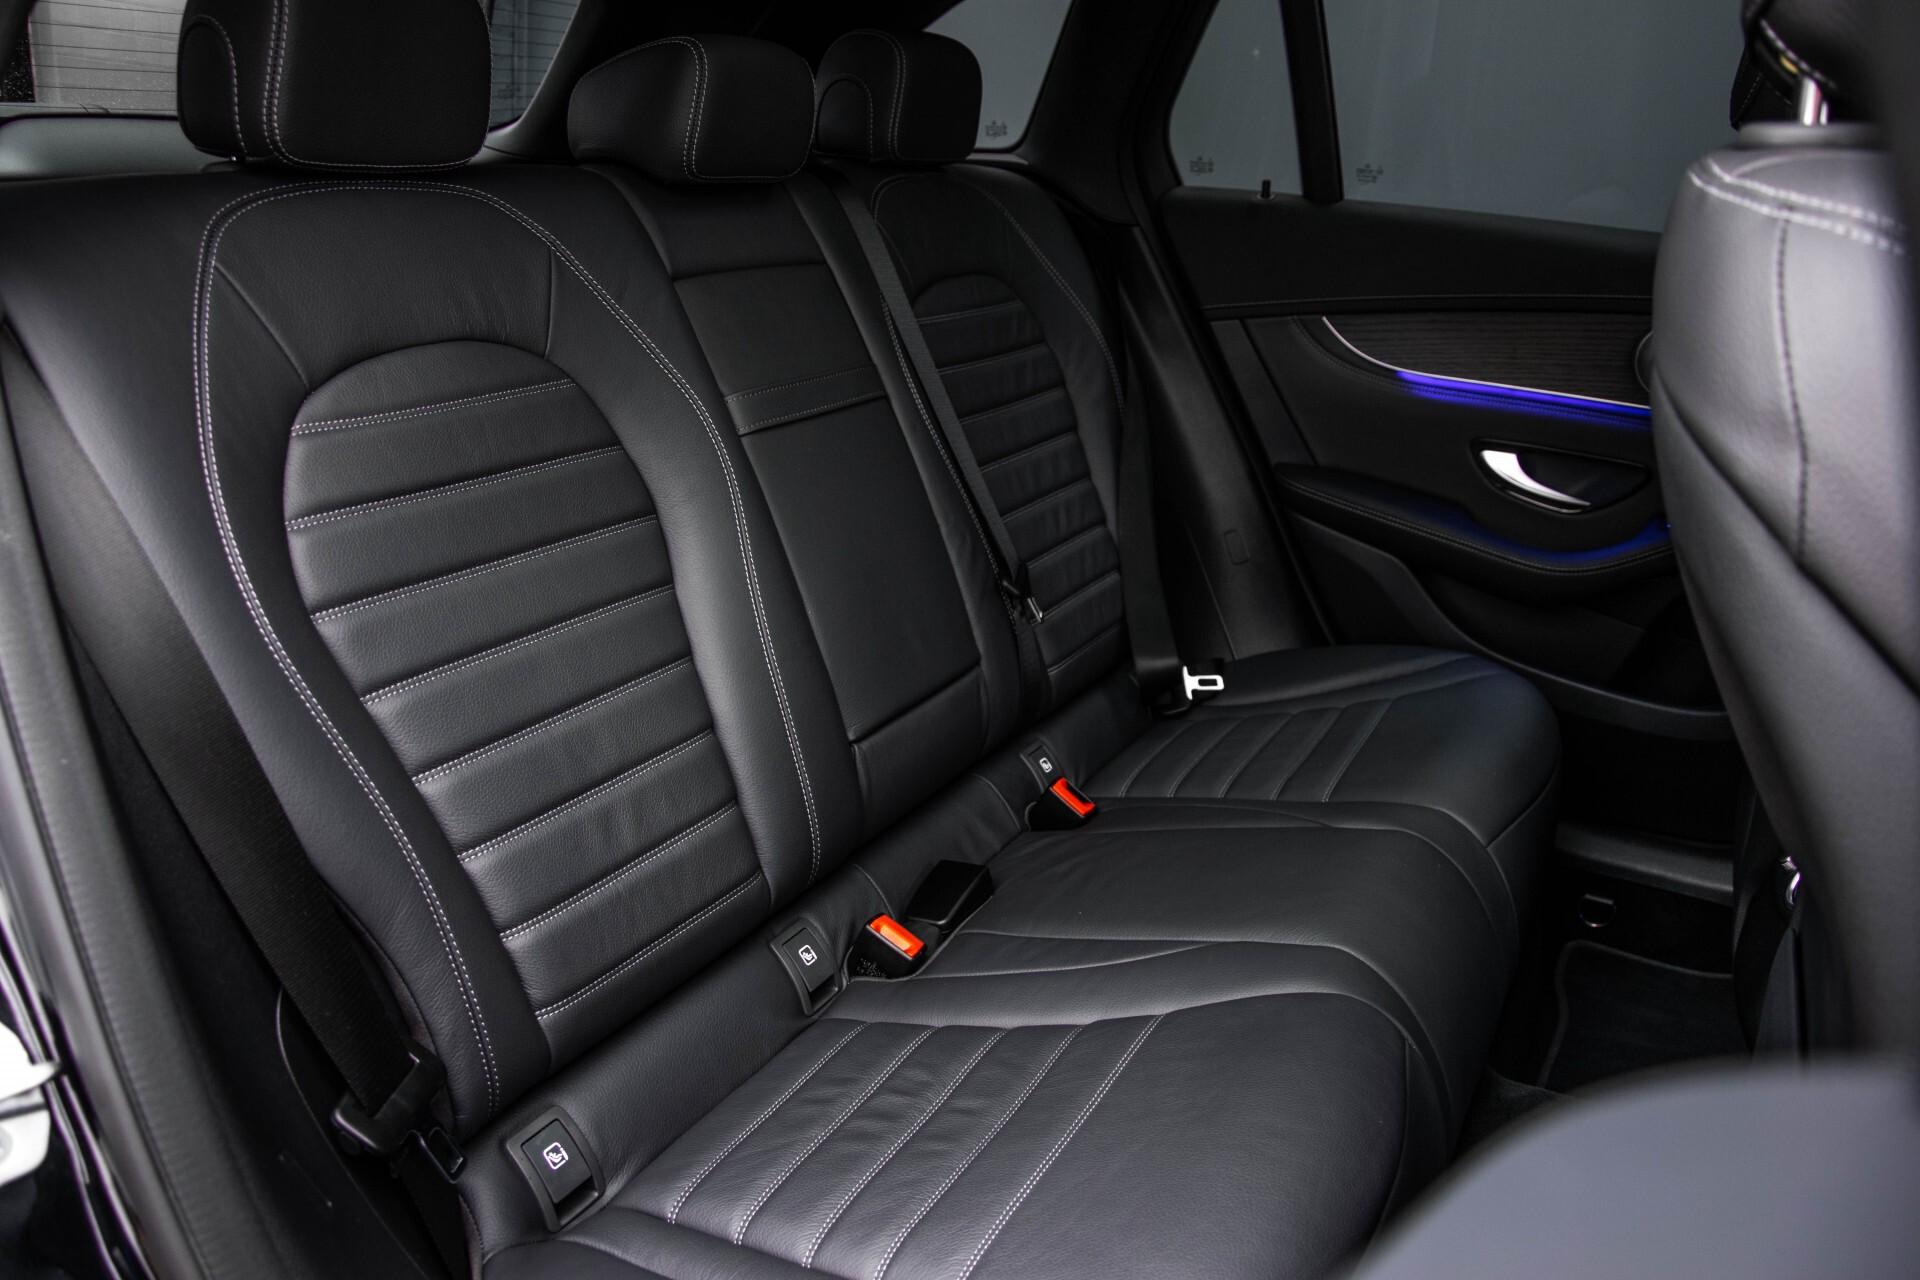 Mercedes-Benz GLC 200 4-M AMG Night/Panorama/Distronic Pro/Burmester/360camera/Exclusive Aut9 Foto 4